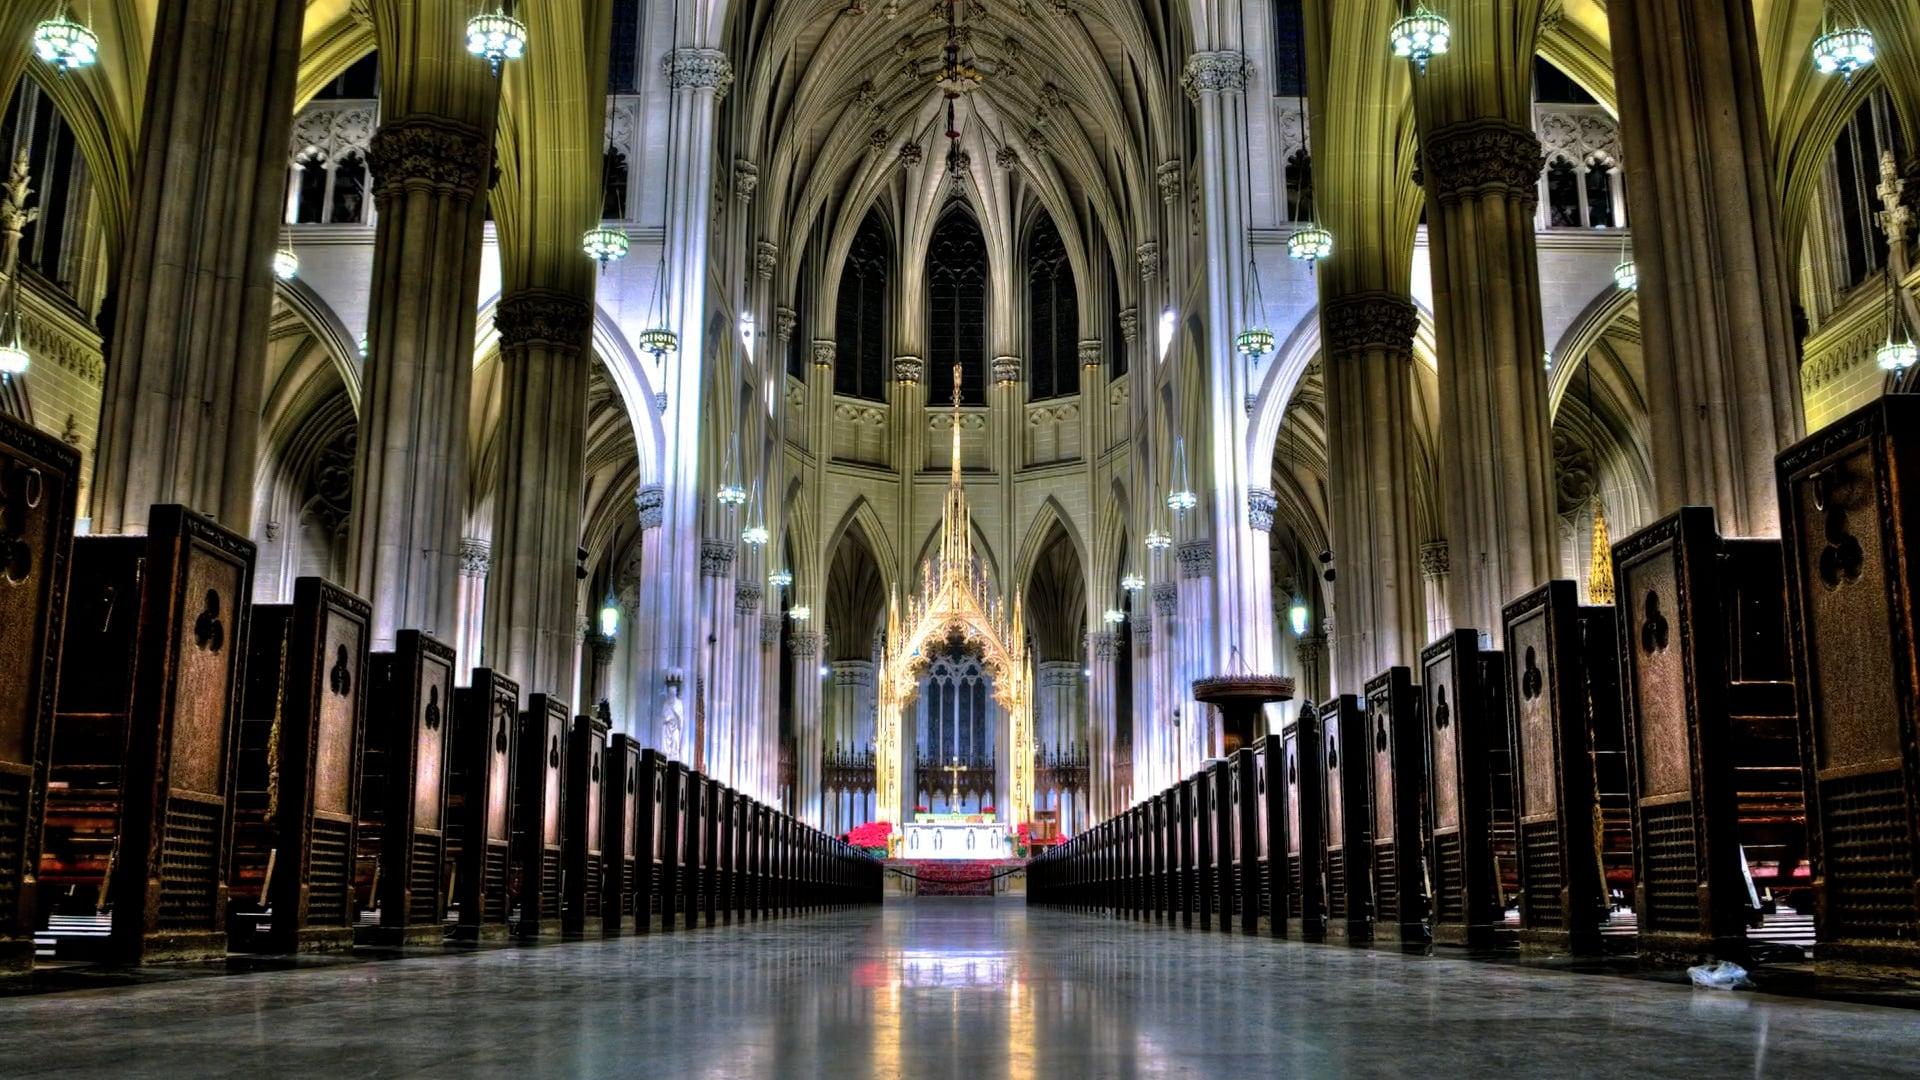 St. Patrick's Mass - October 21, 2021